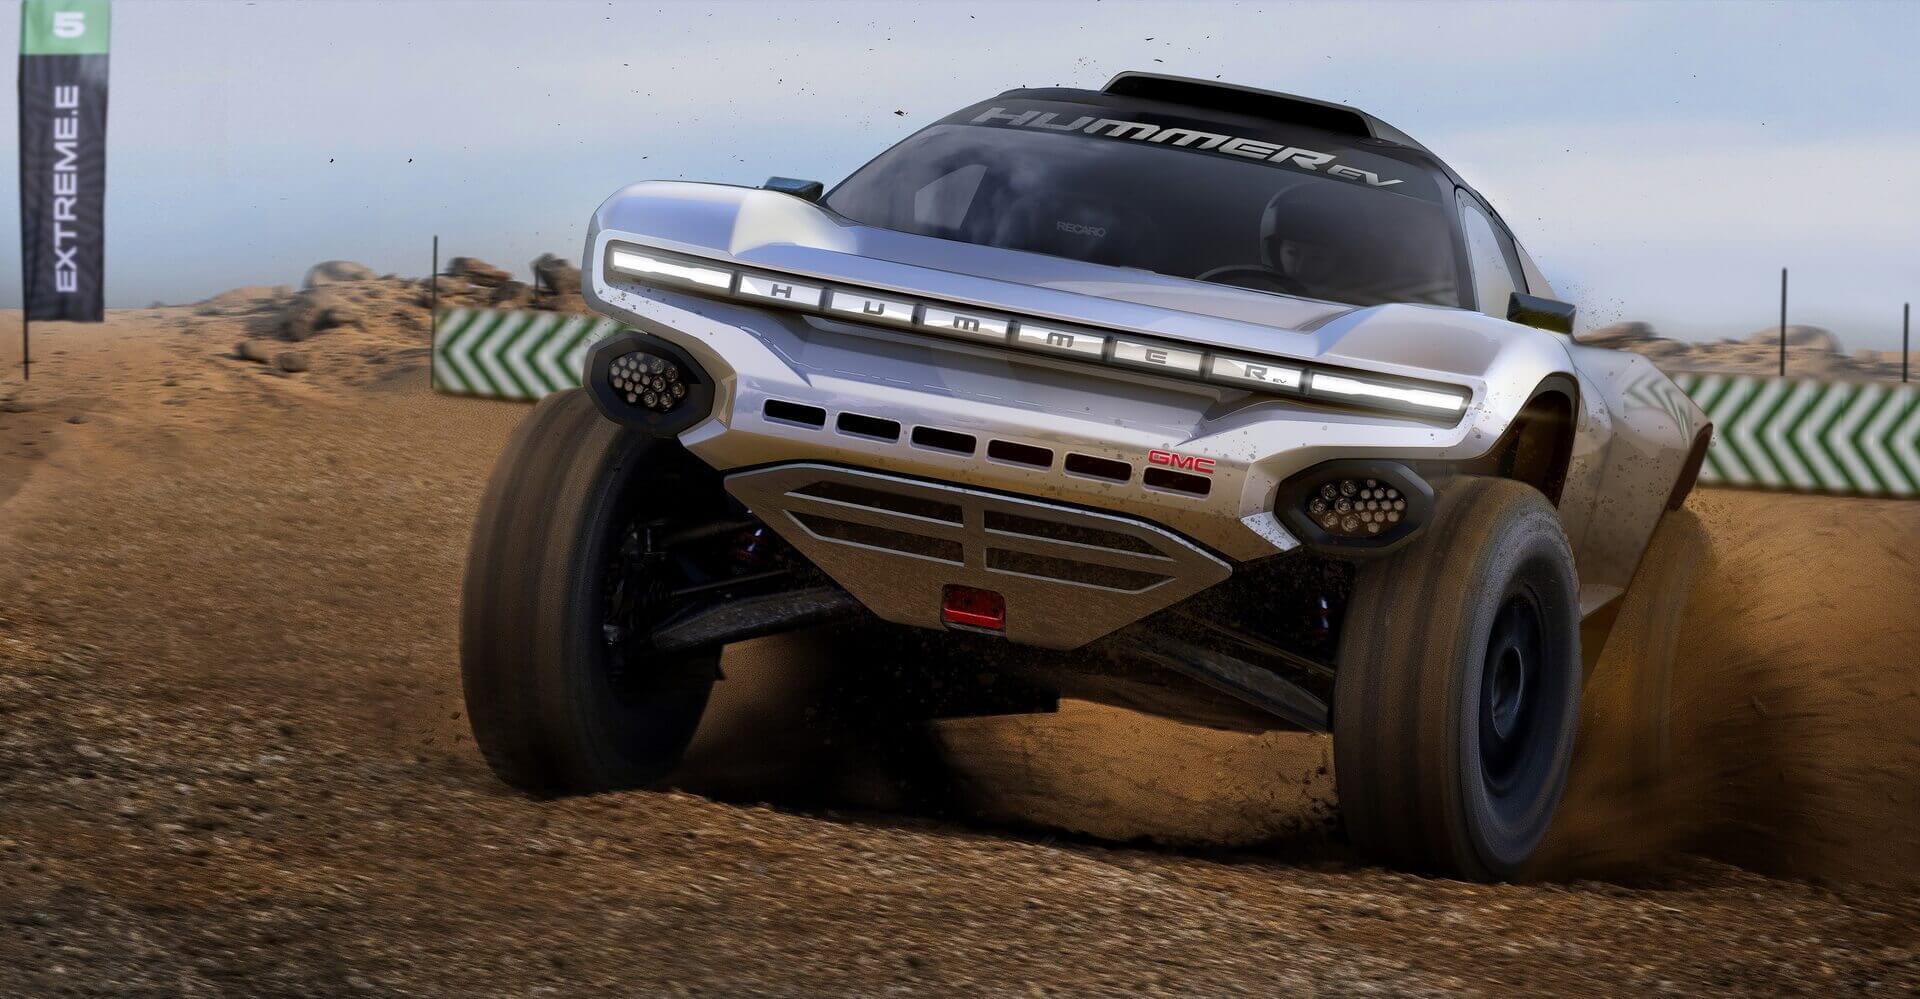 GMC объединились с Chip Ganassi Racing в серии Off-Road гонок Extreme E